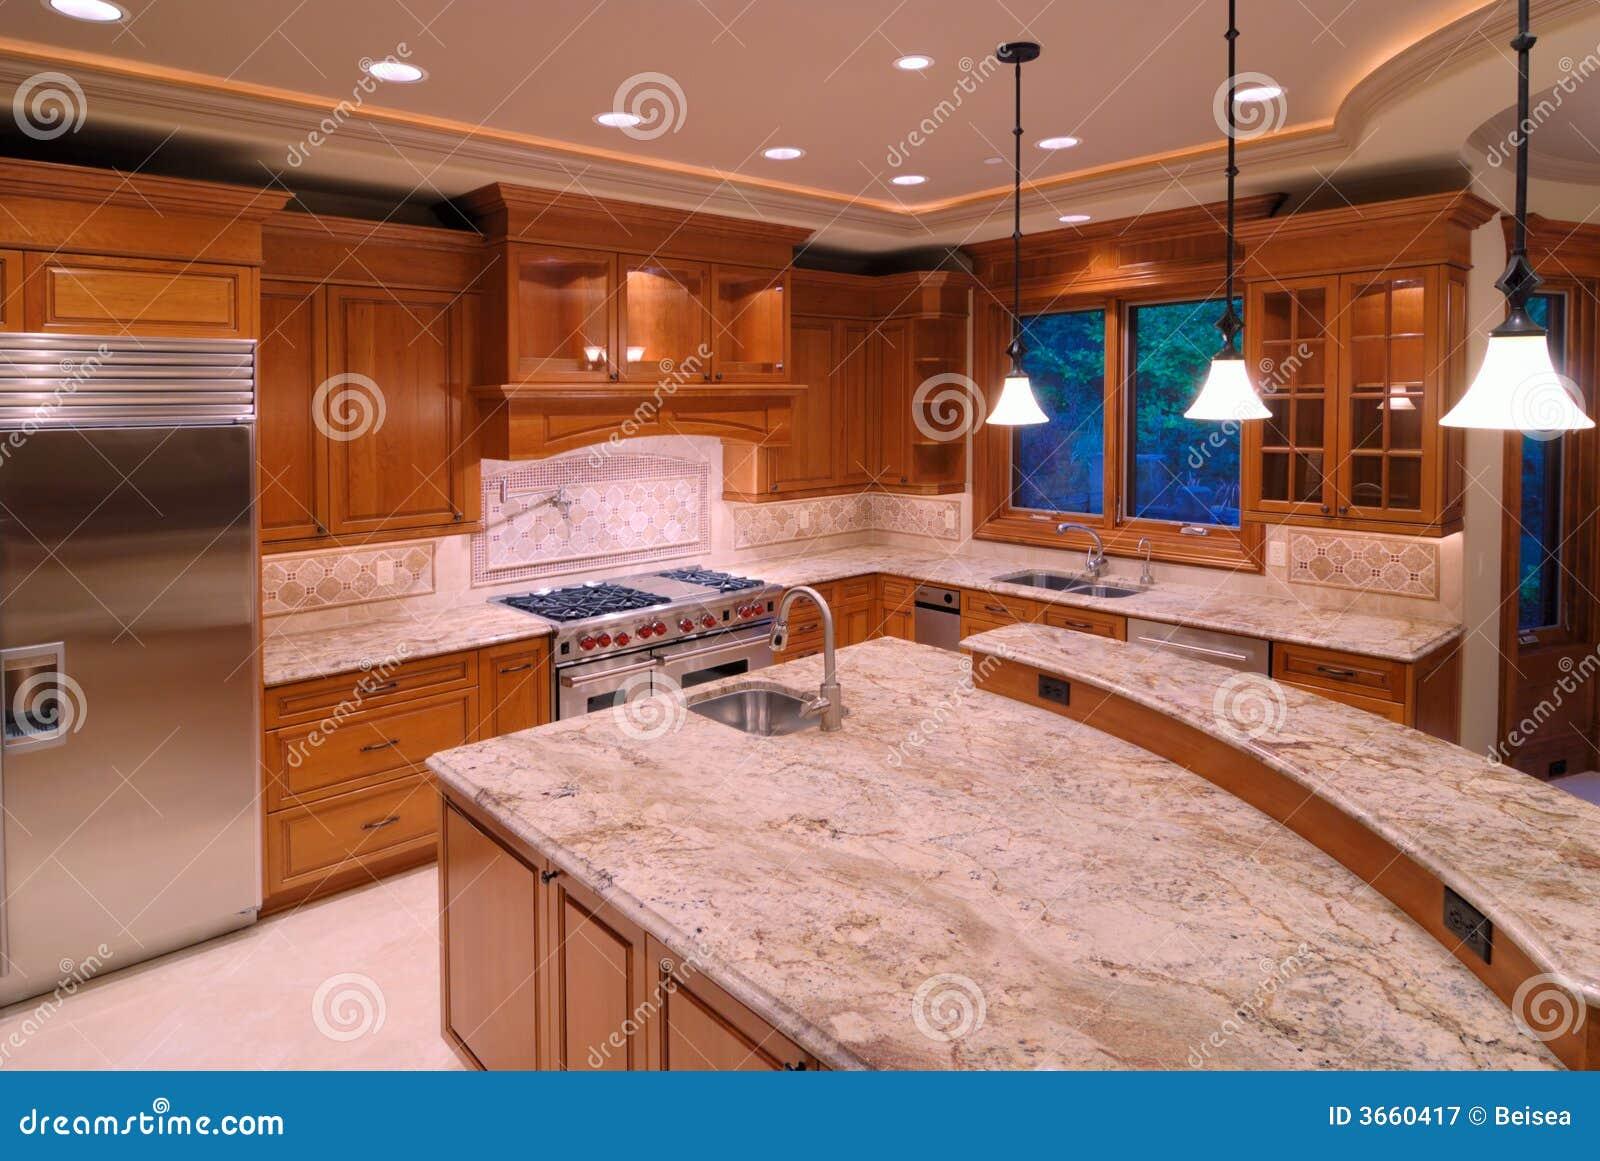 Amerikanische Villa Stock Photos - Download 85 Images